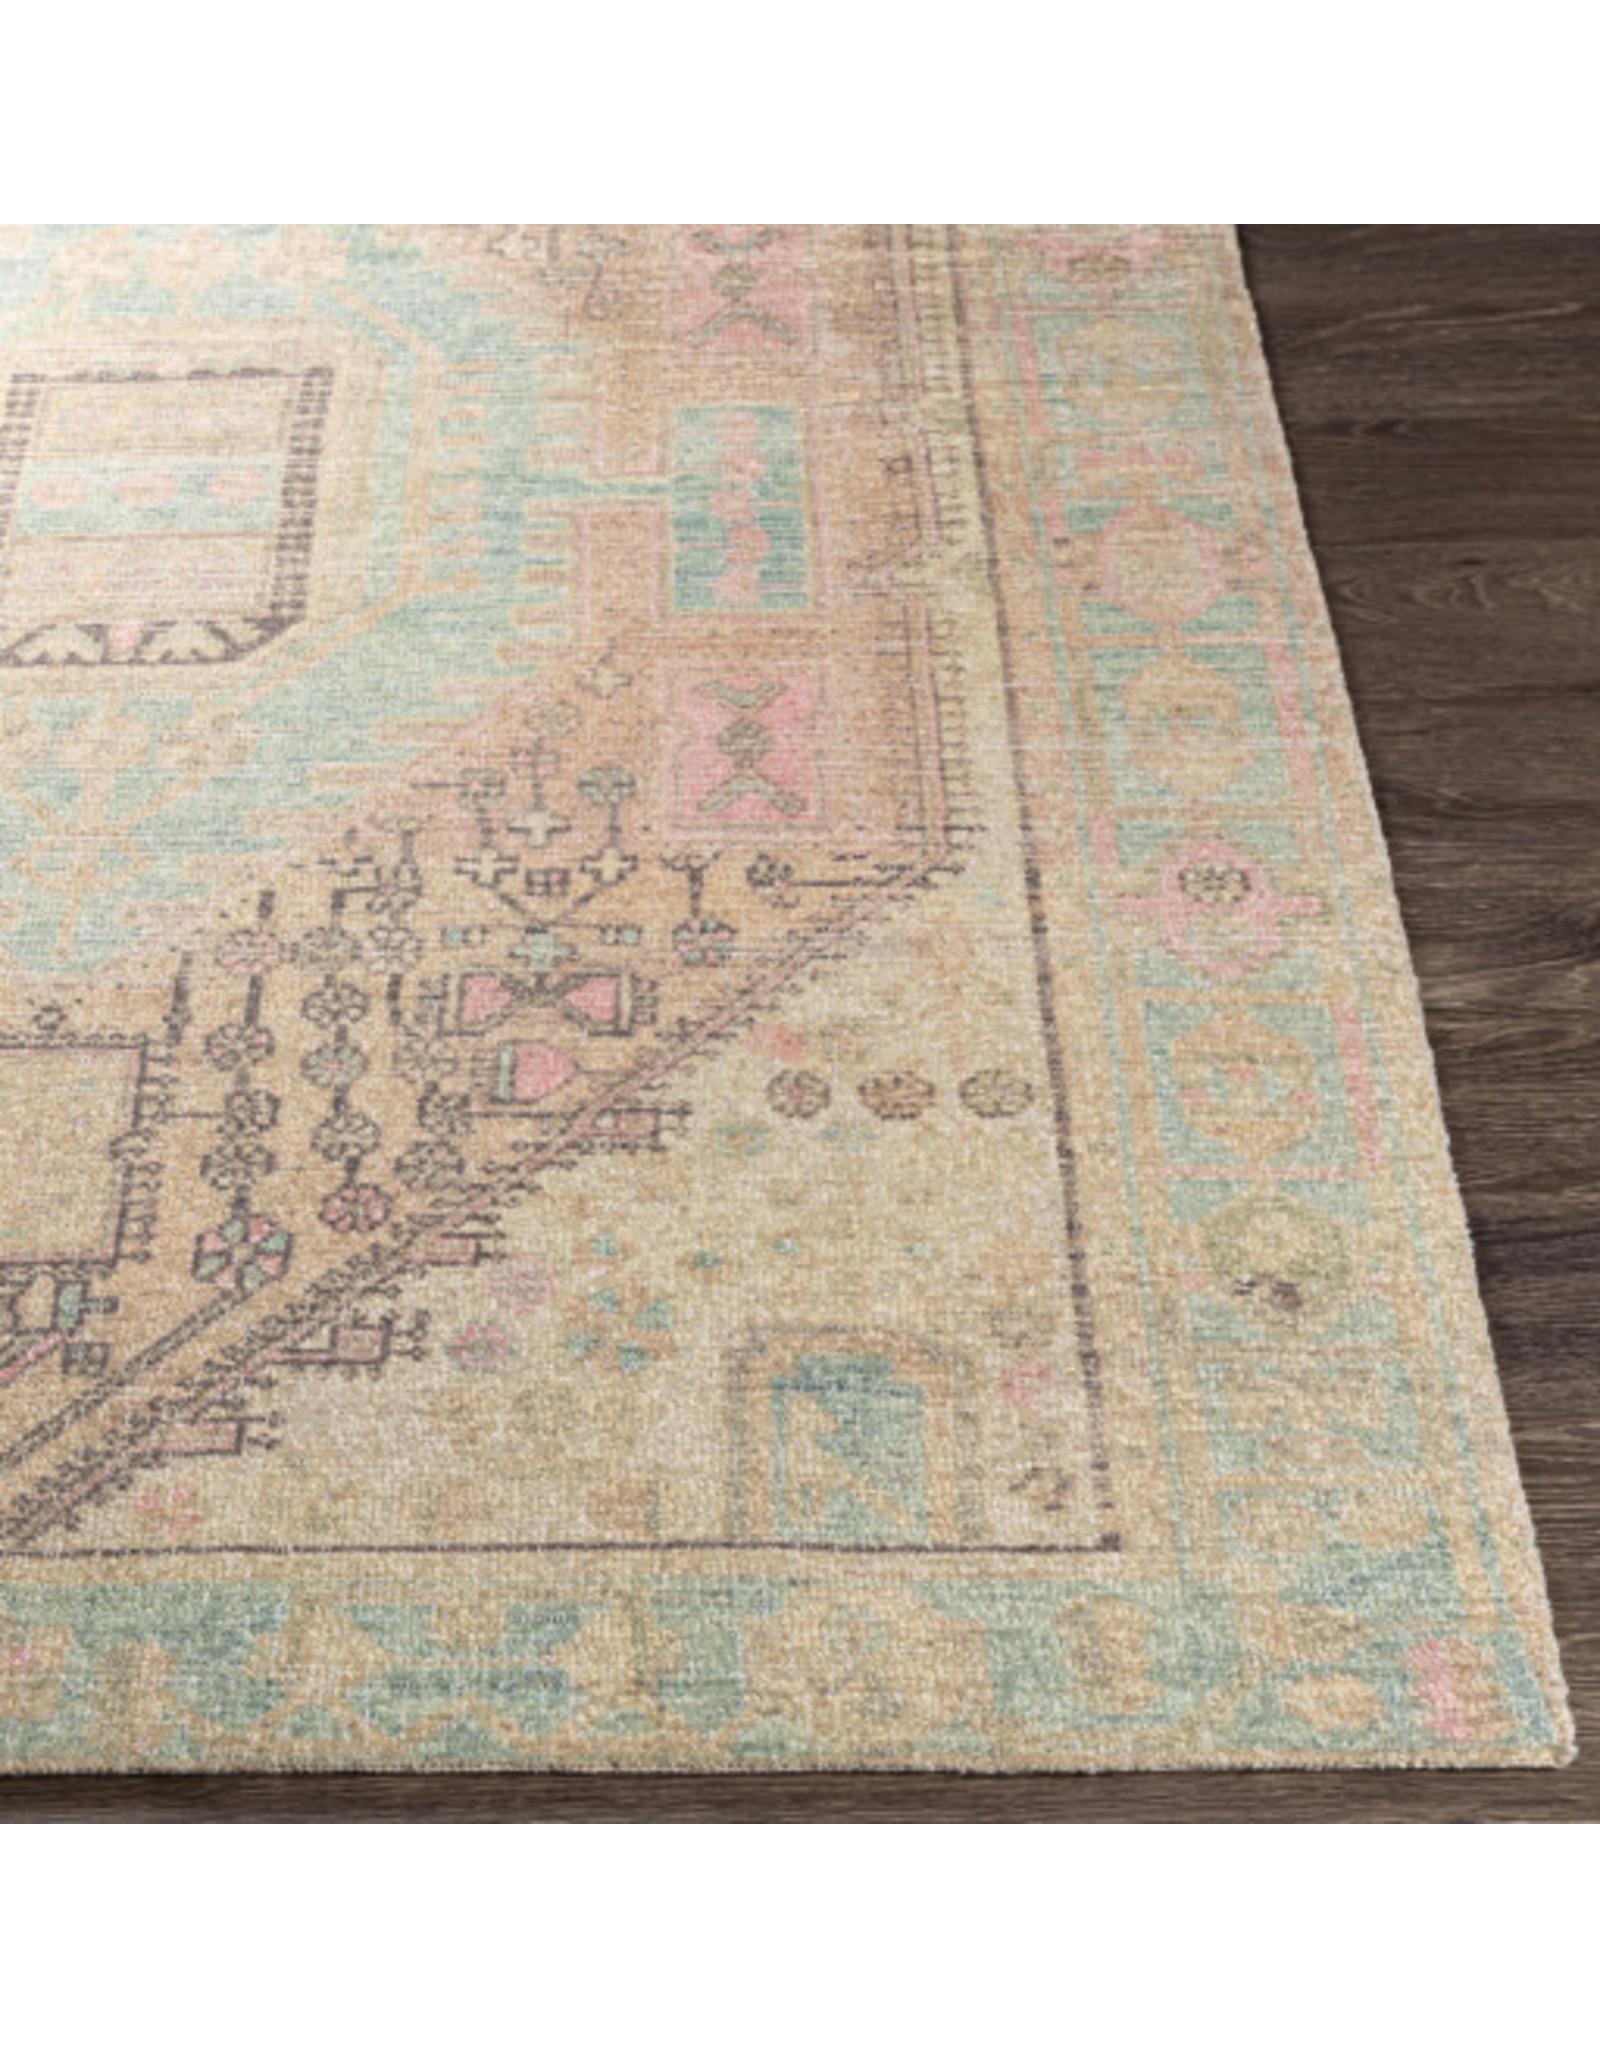 Oak + Arrow Interiors Unique Rug - Pink and Lime 2'x3'